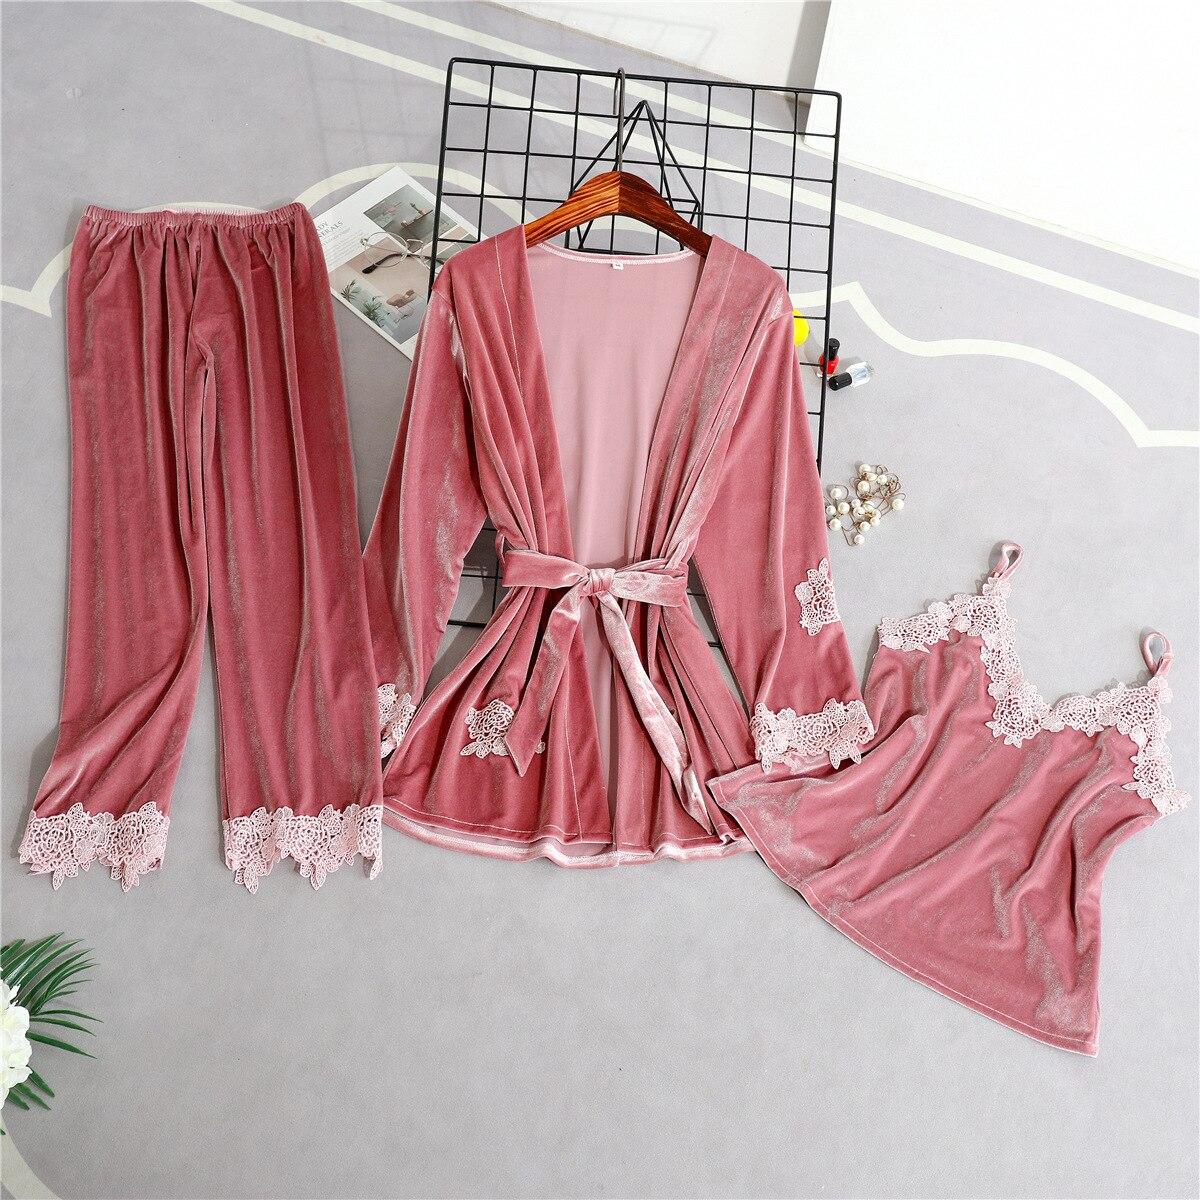 3PCS Women Casual Pajamas Set Velvet Home Clothes Lady Sexy Lace Pyjamas Suit Spring Autumn Robe&Nightie&Pant Nightwear M L XL 39